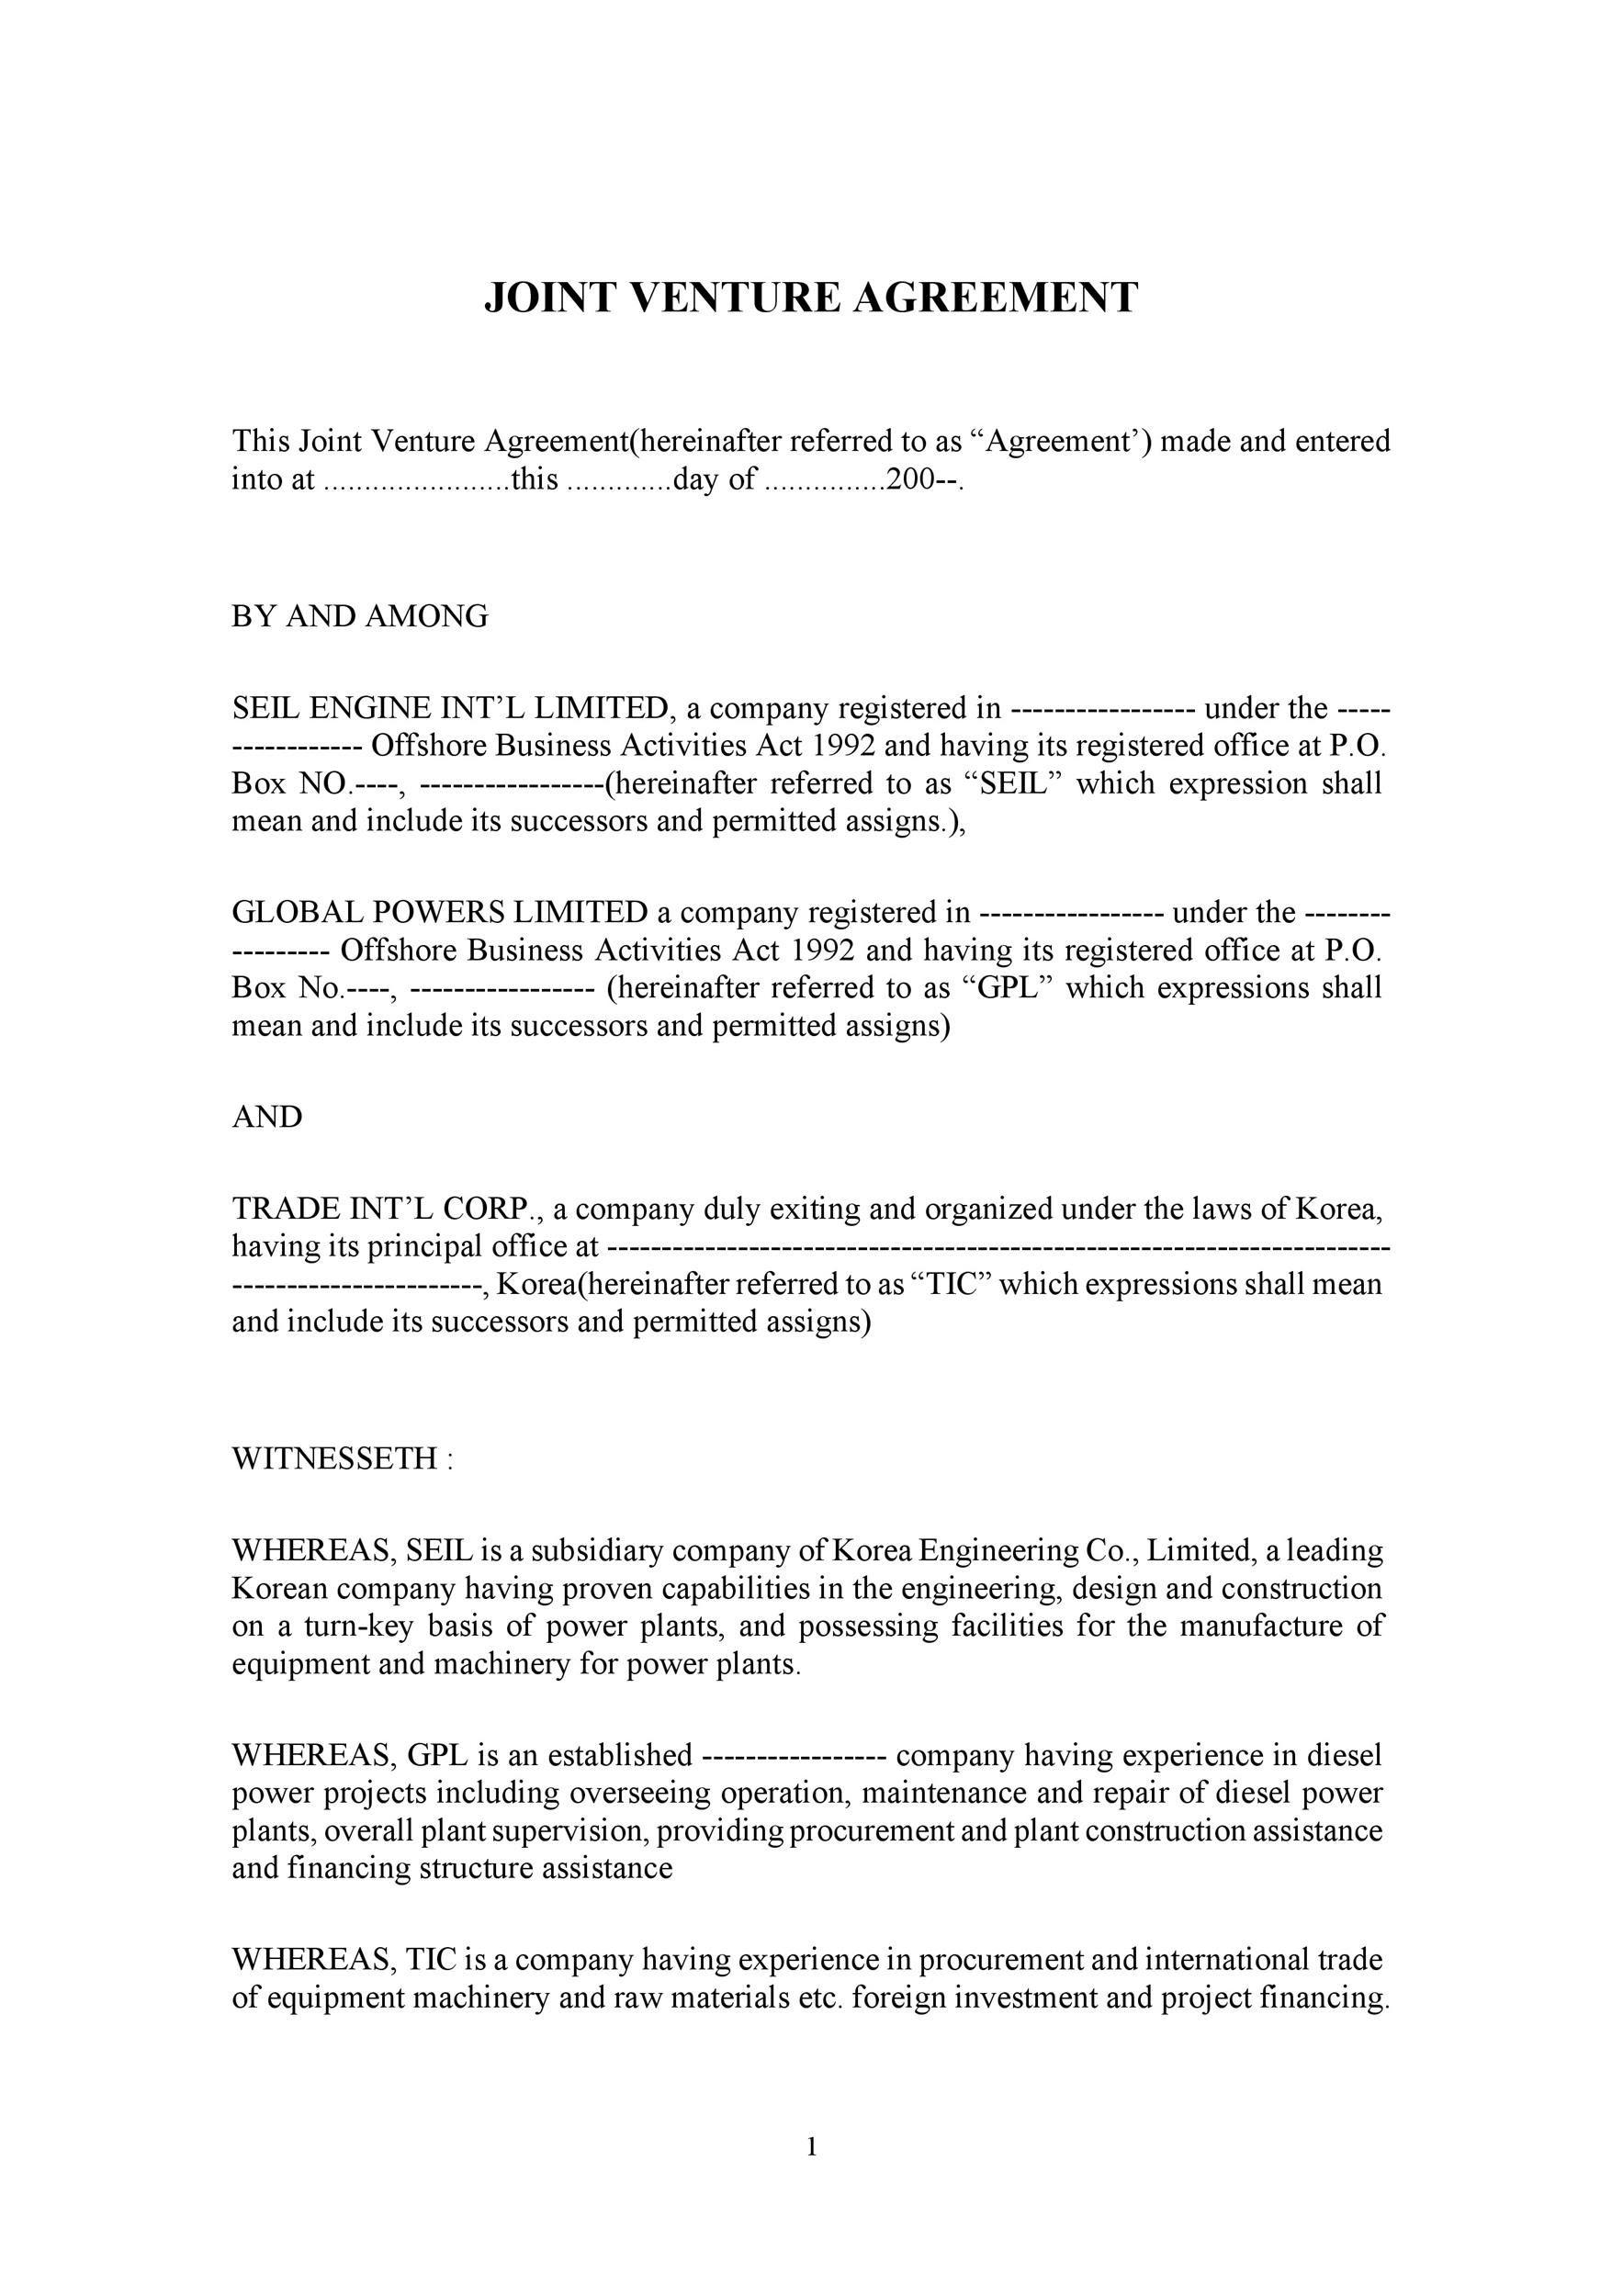 006 Marvelou Joint Venture Agreement Template Doc Example  UkFull